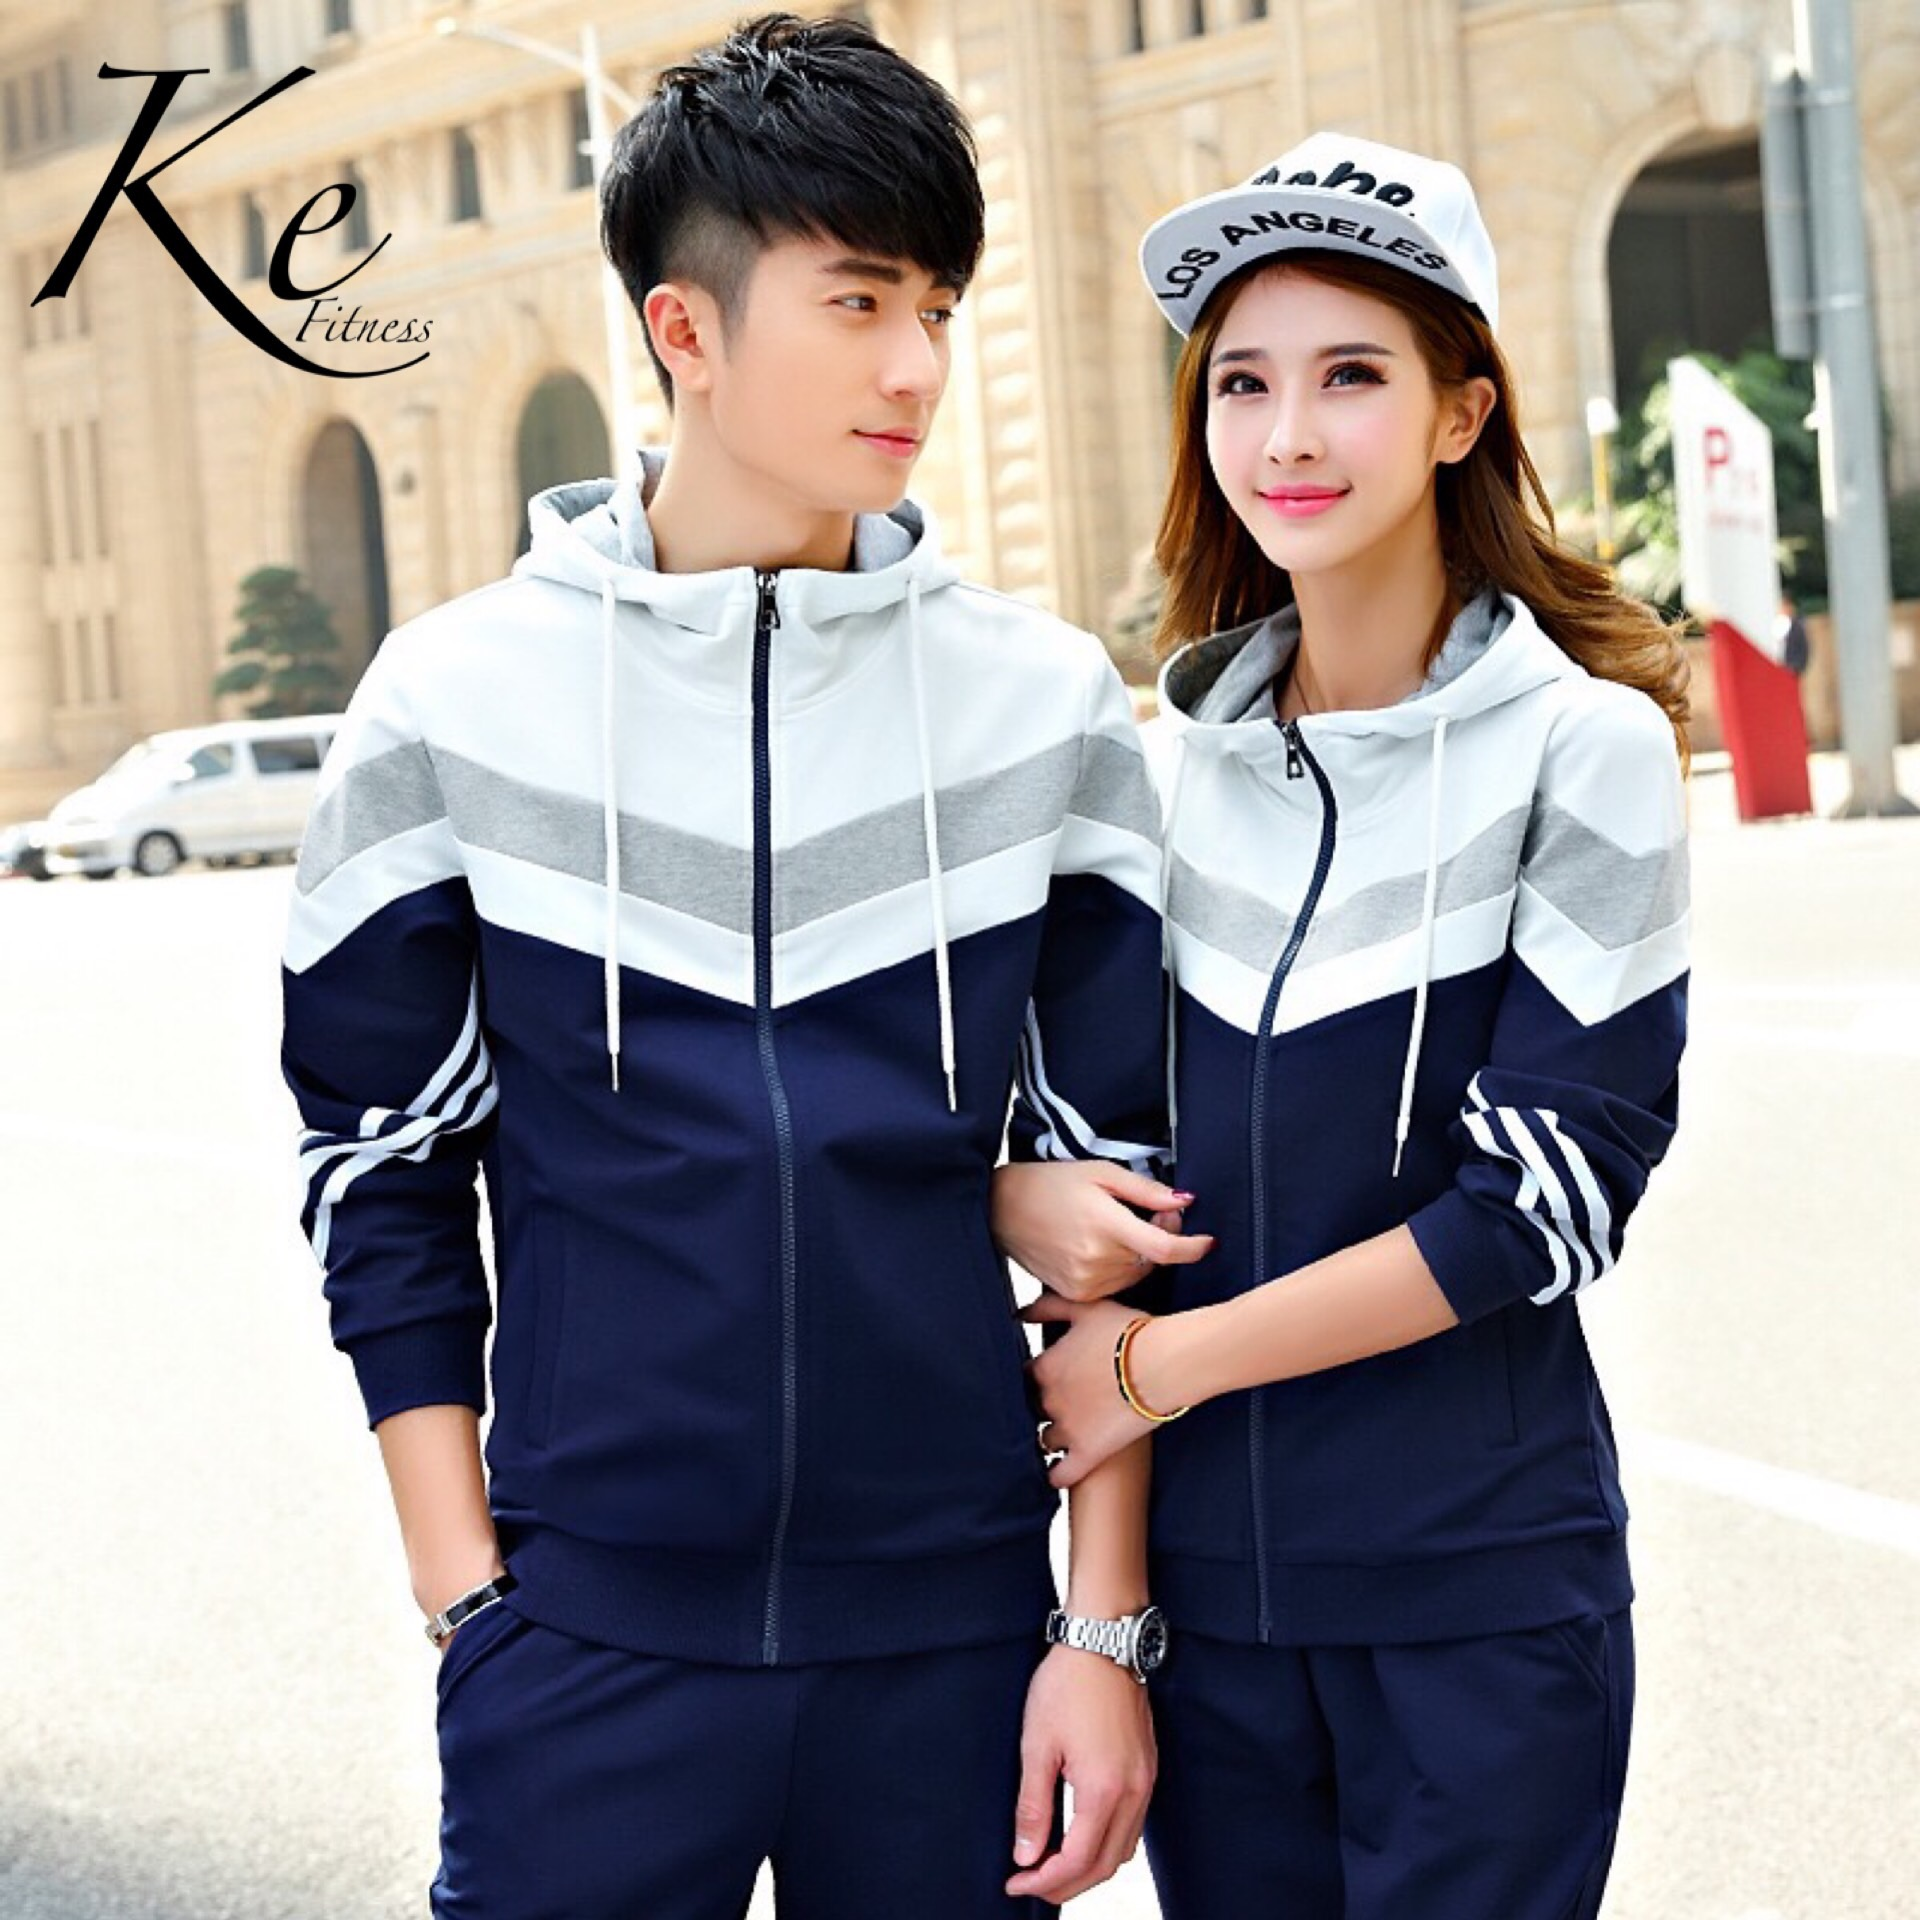 KE New Sports For Autumn Casual Suit Couple Tracksuit Man Woman Sportswear Big Size Plus To 4XL  Sportswear 2 Pieces Sport Set